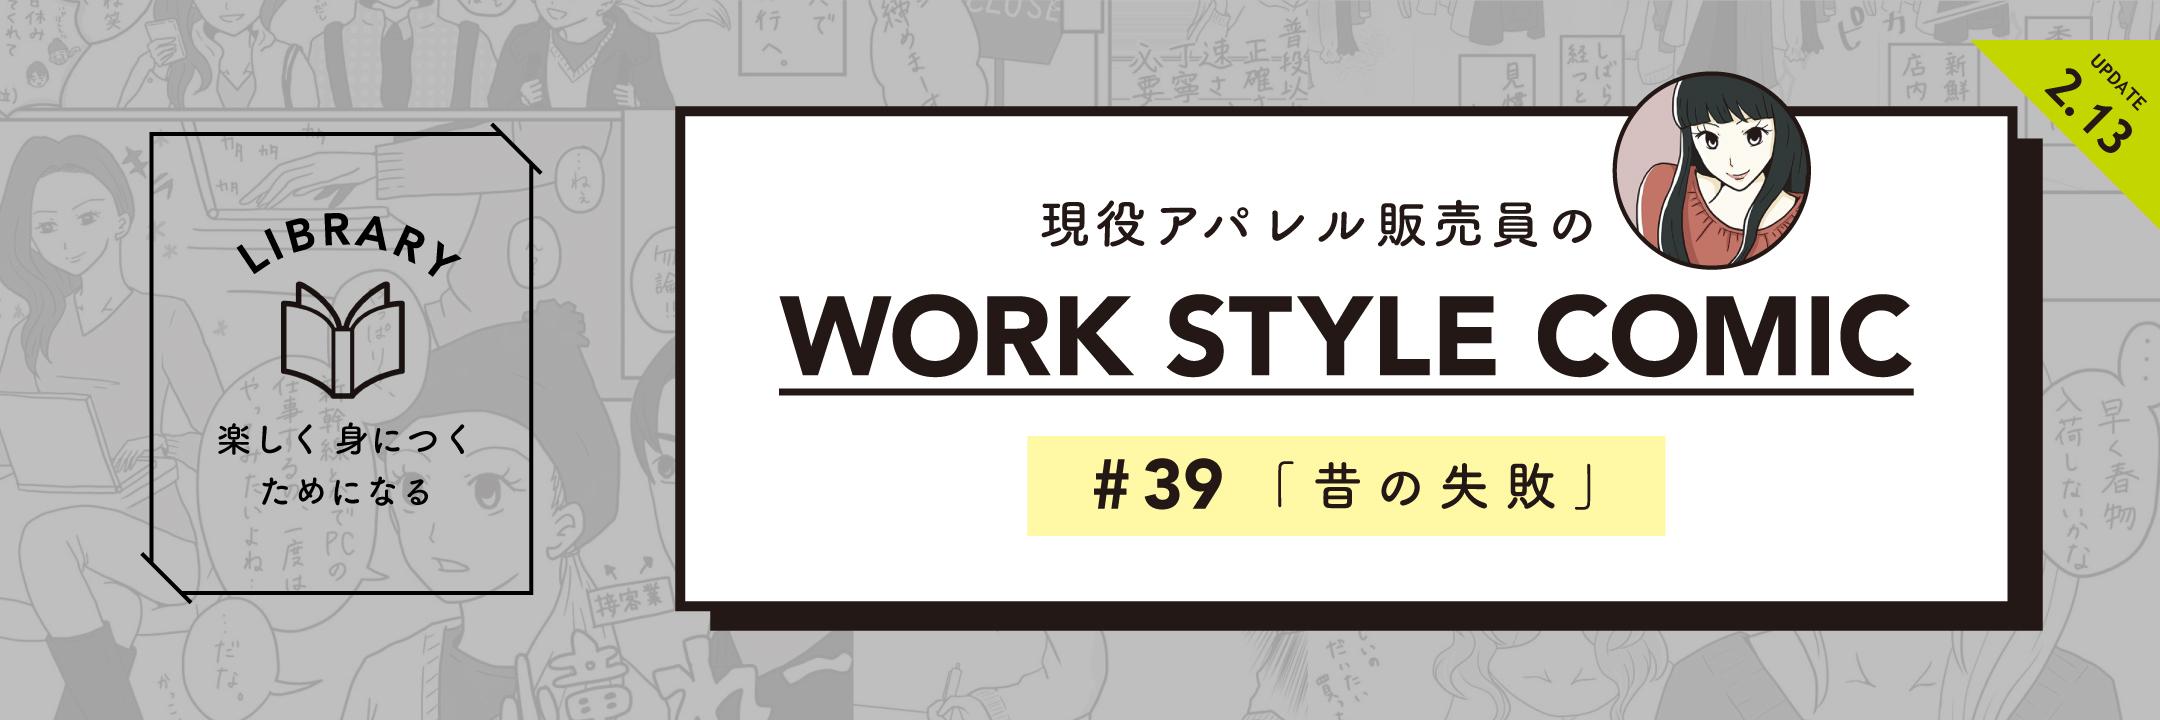 WORK STYLE COMIC39